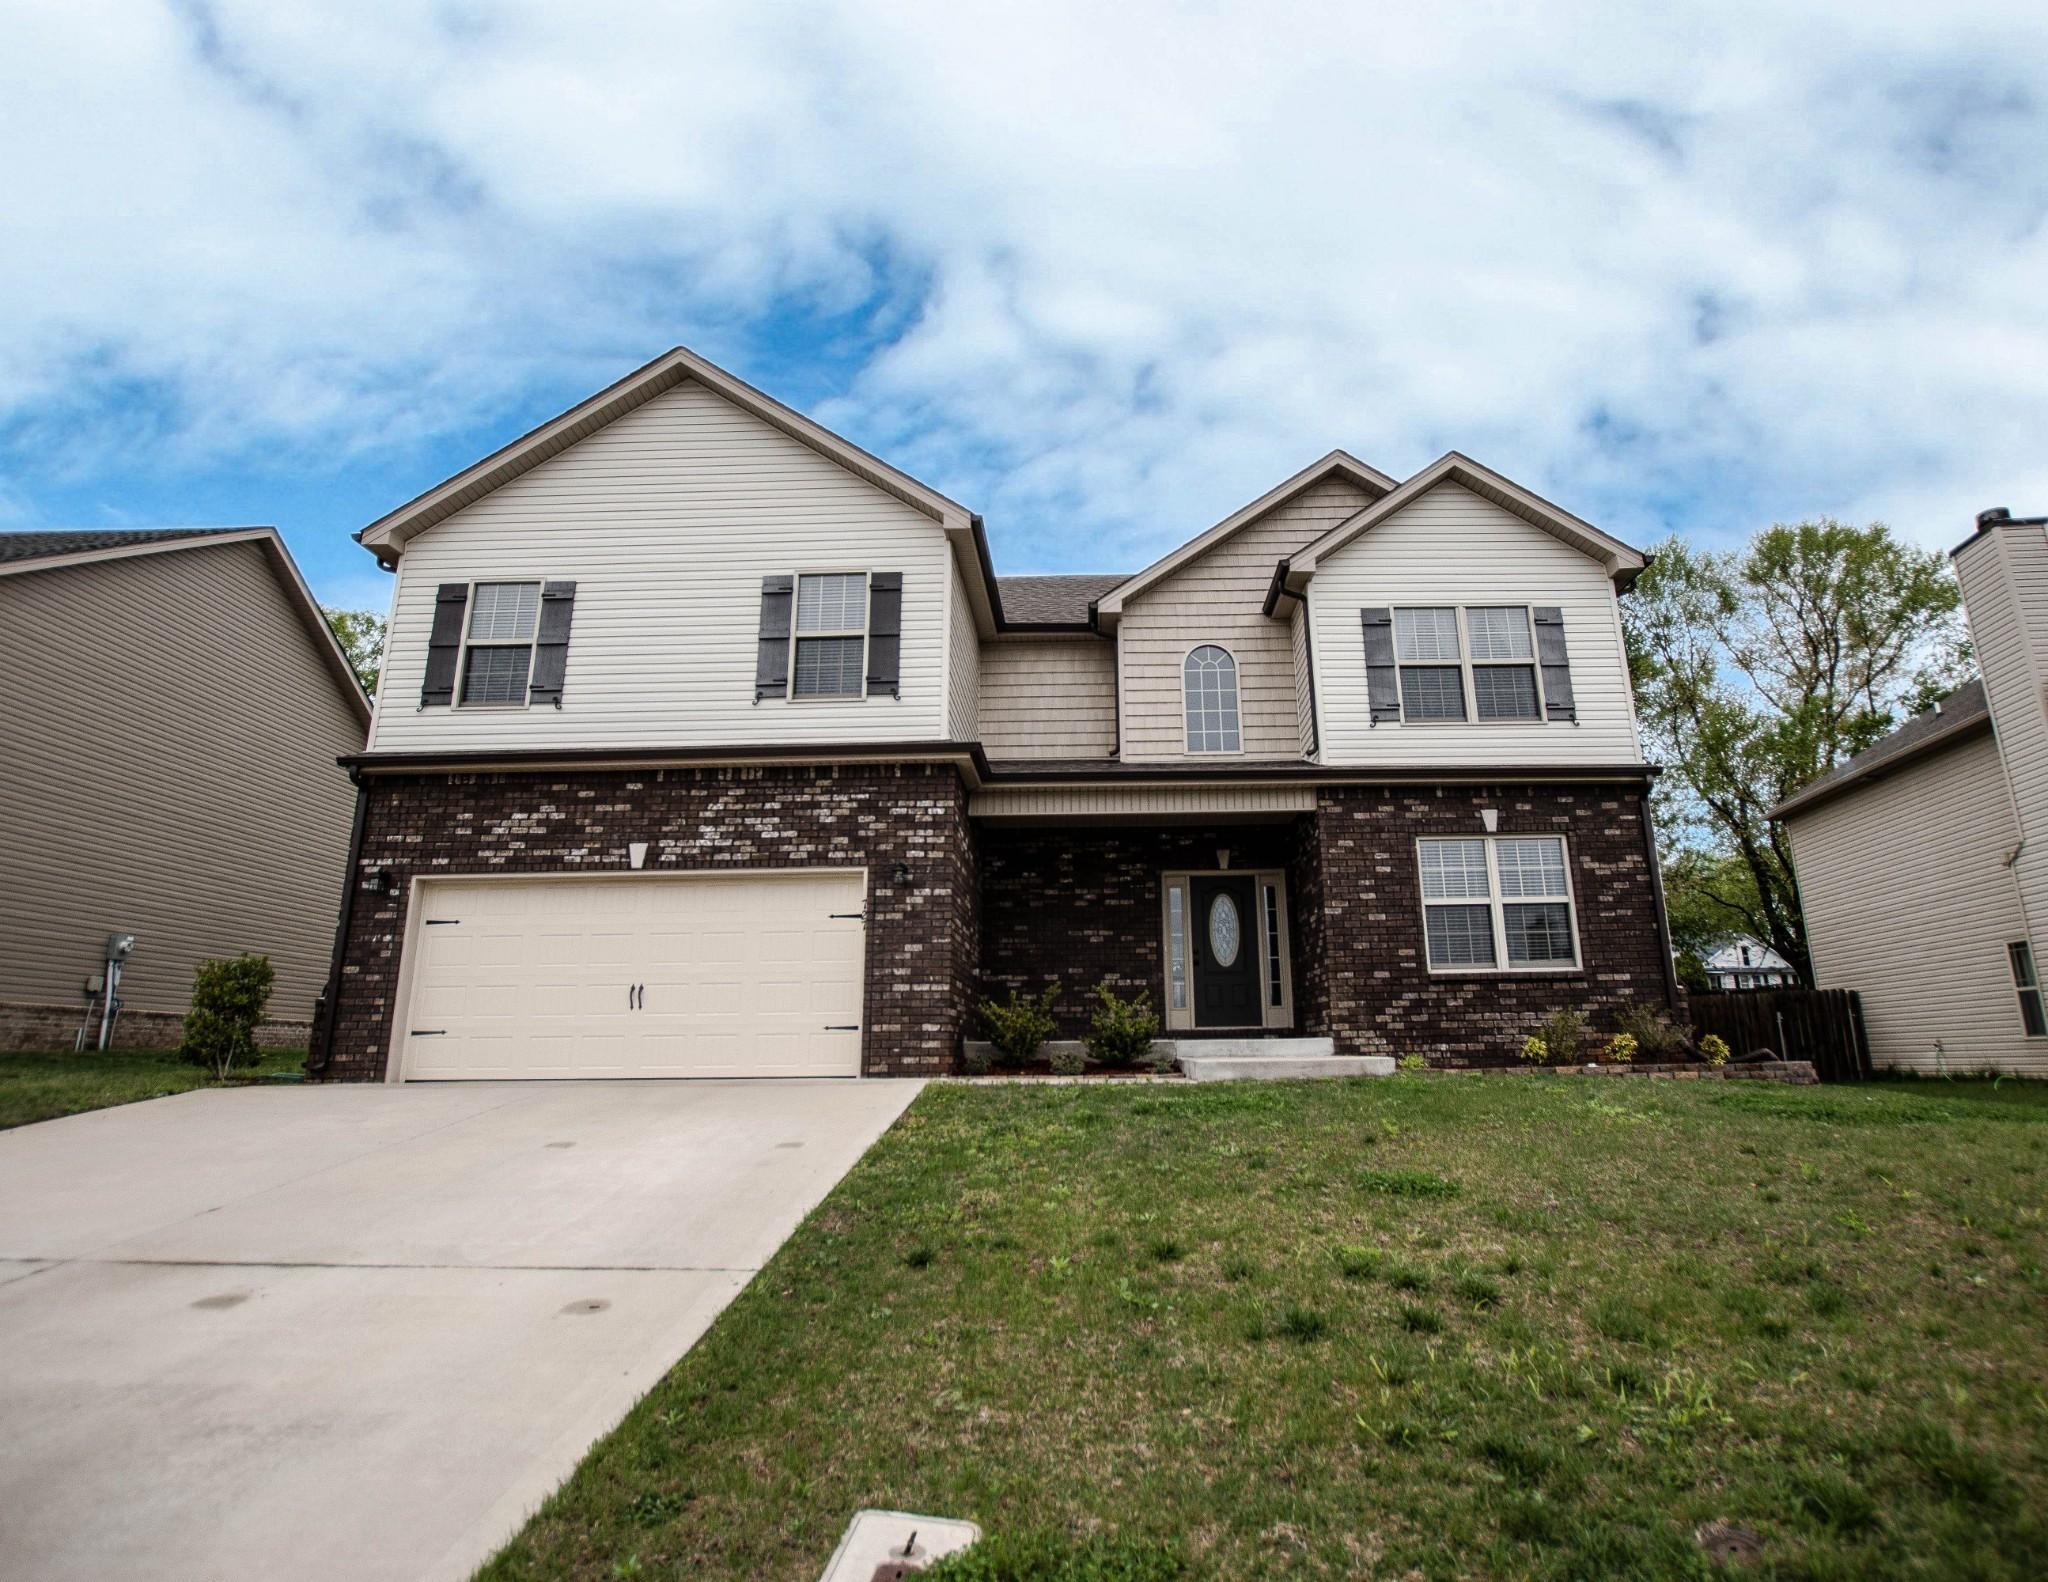 727 Sturdivant Dr Property Photo - Clarksville, TN real estate listing